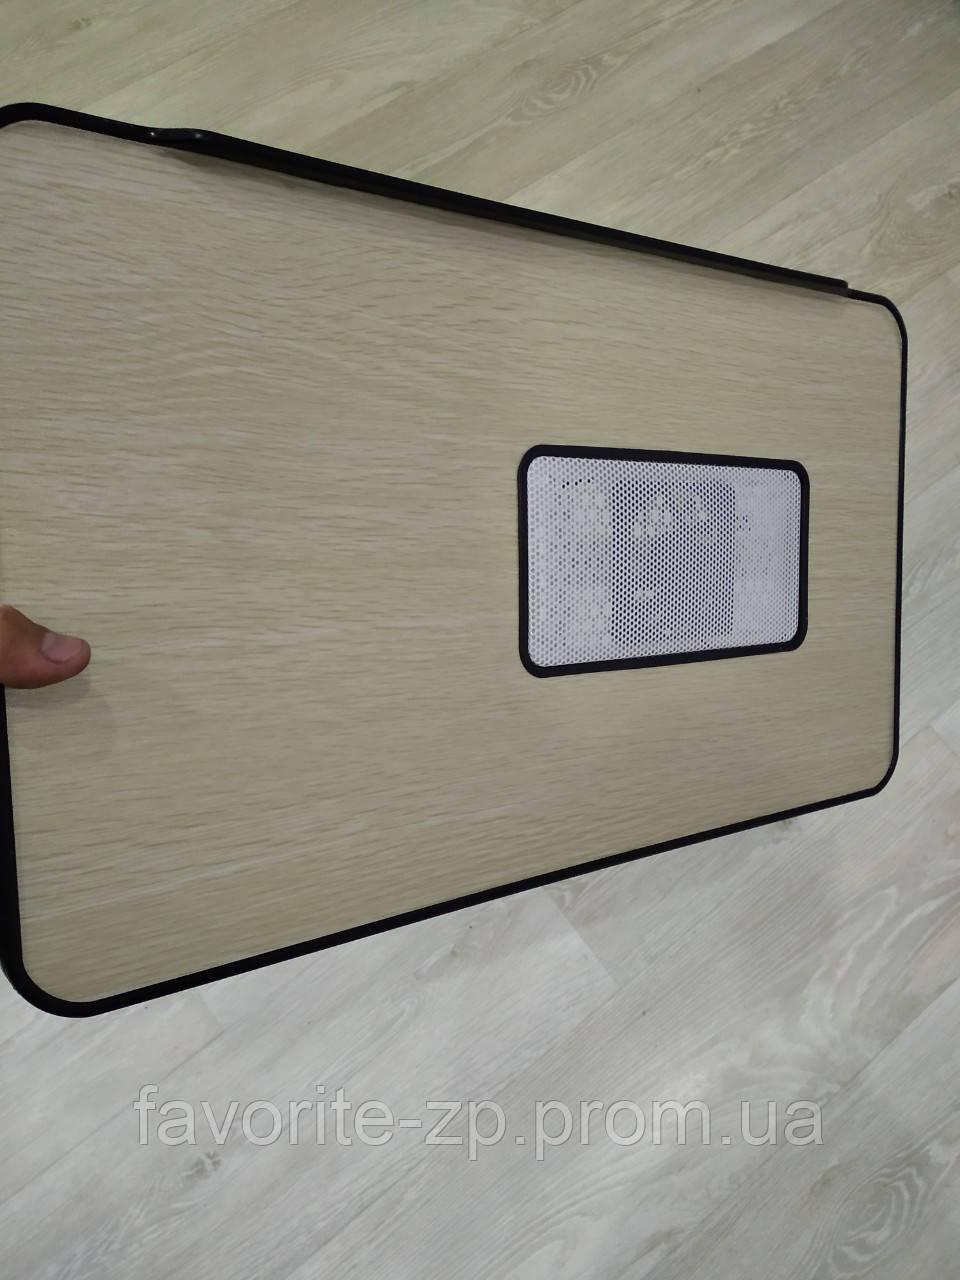 Подставка для ноутбука с кулером MHZ Laptop table A8